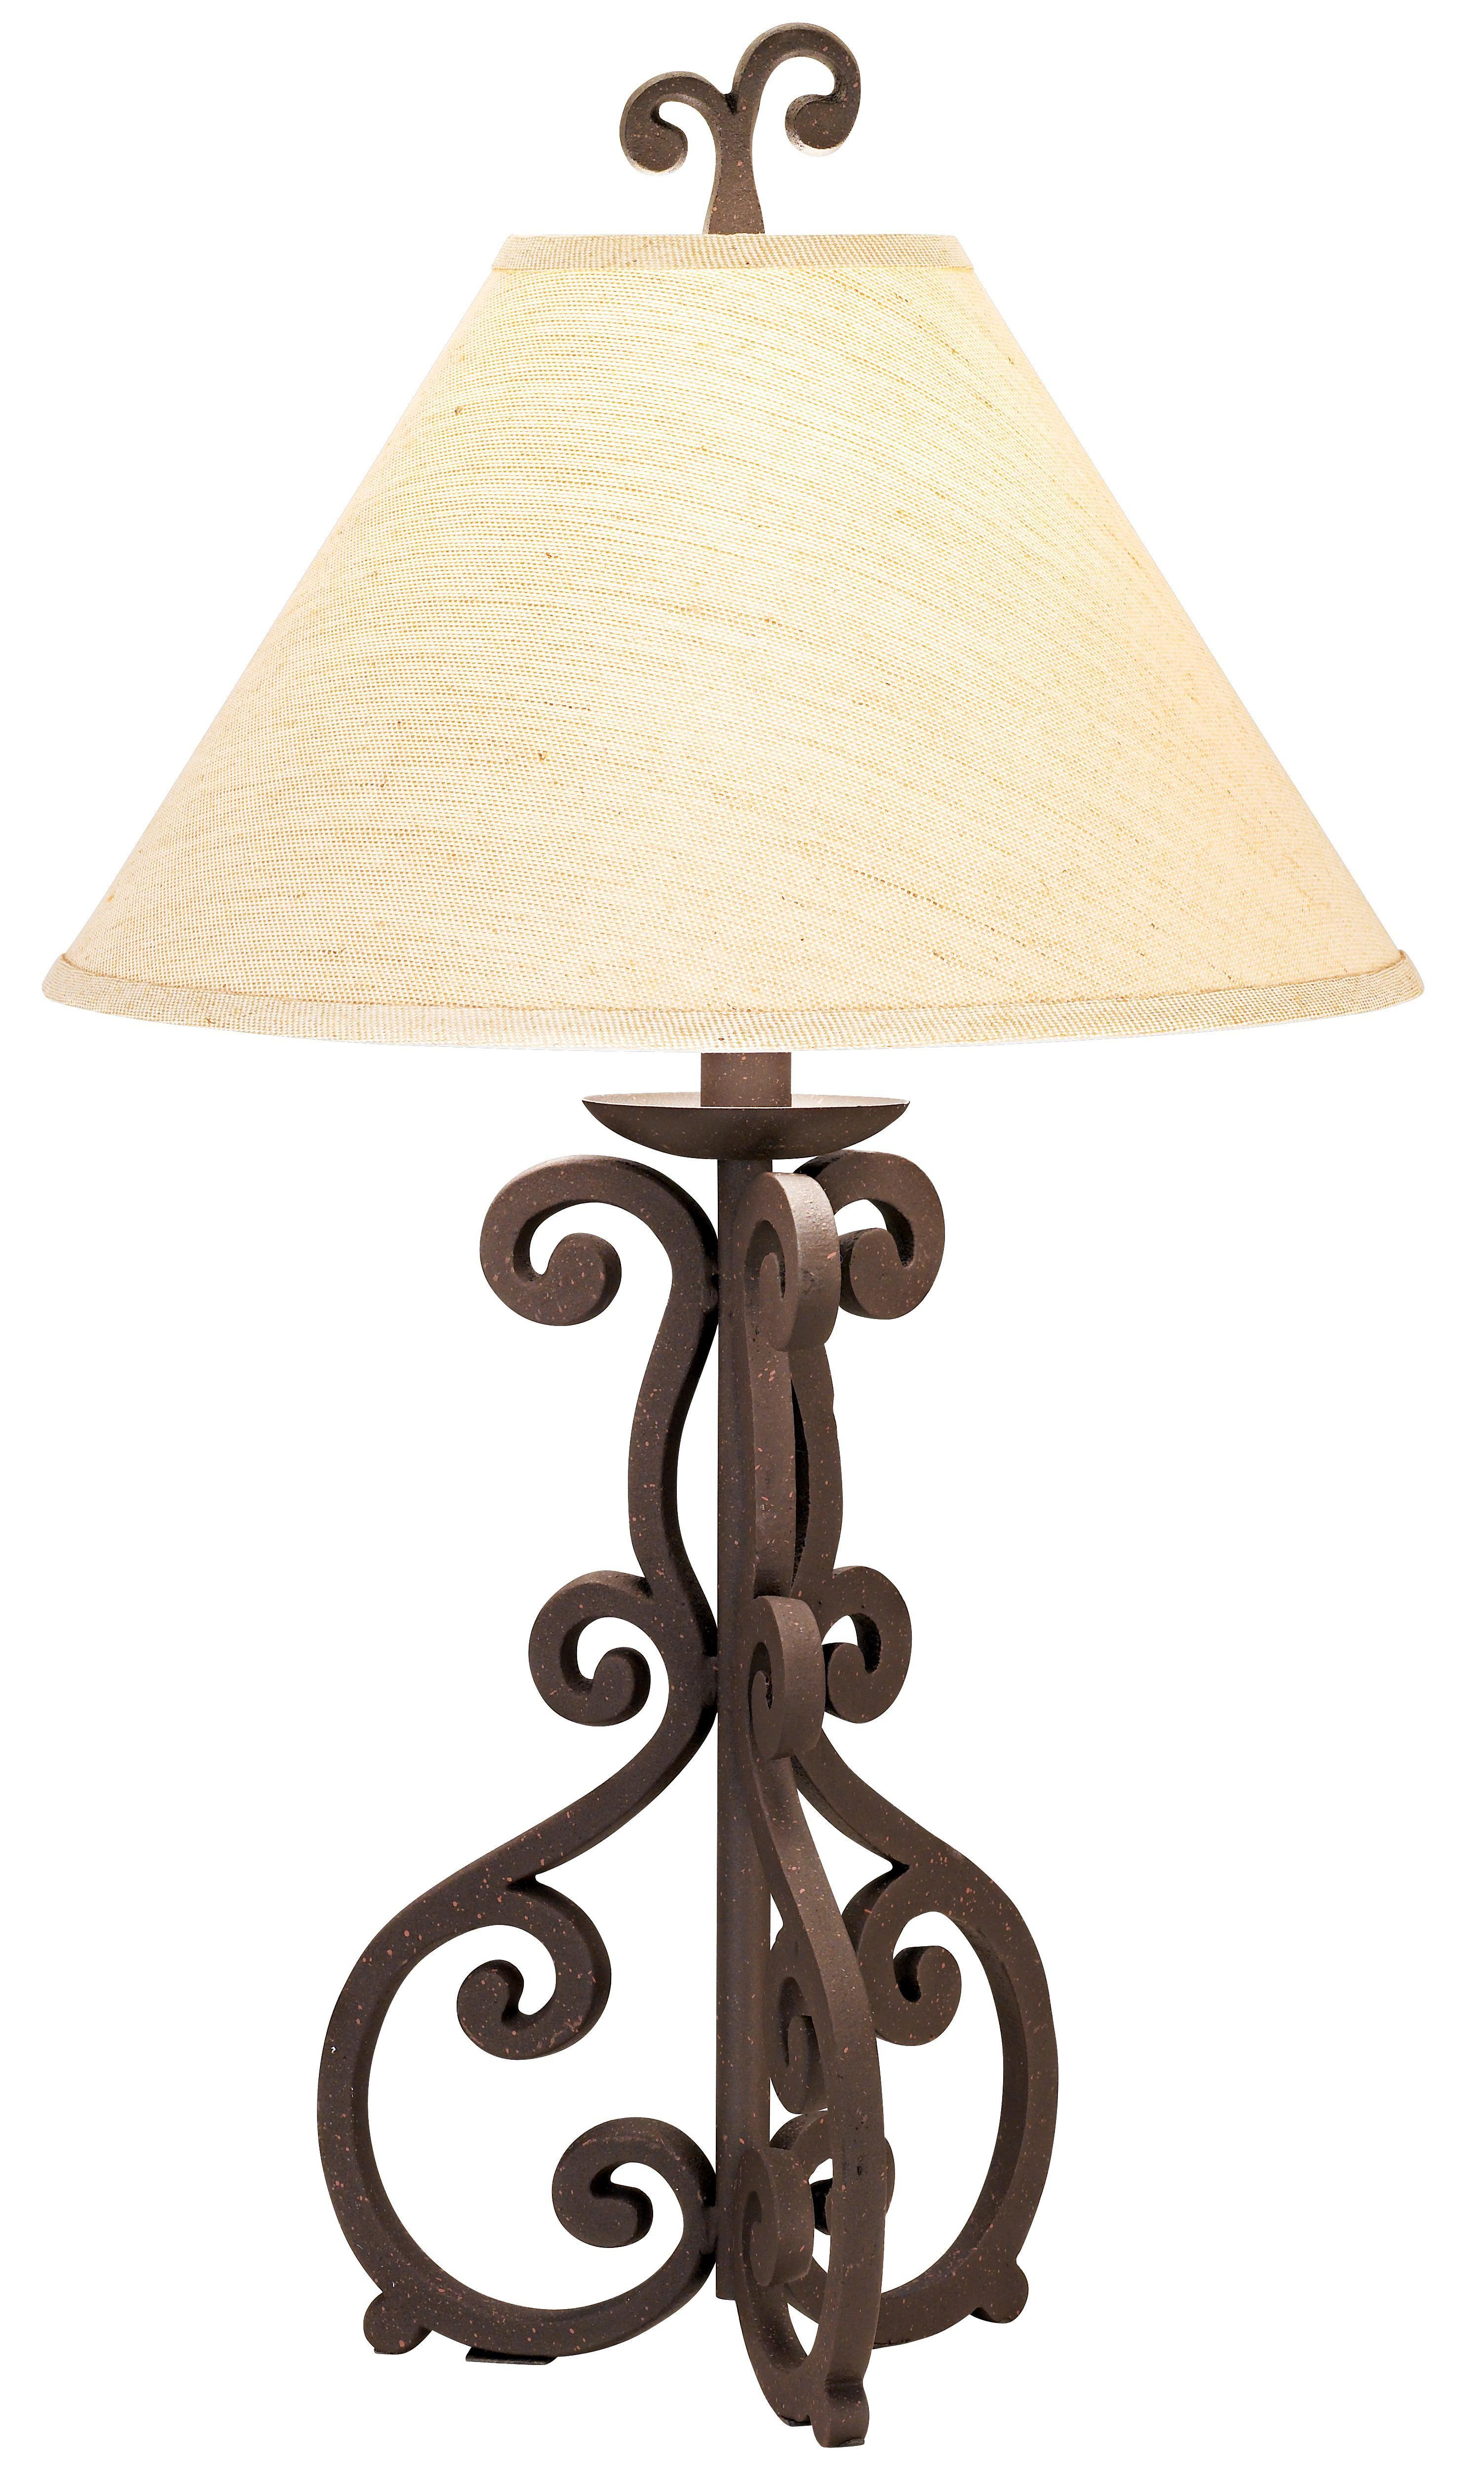 High Iron Scroll Table Lamp 51410 Lamps Plus Lamp Table Lamp Iron Lamp